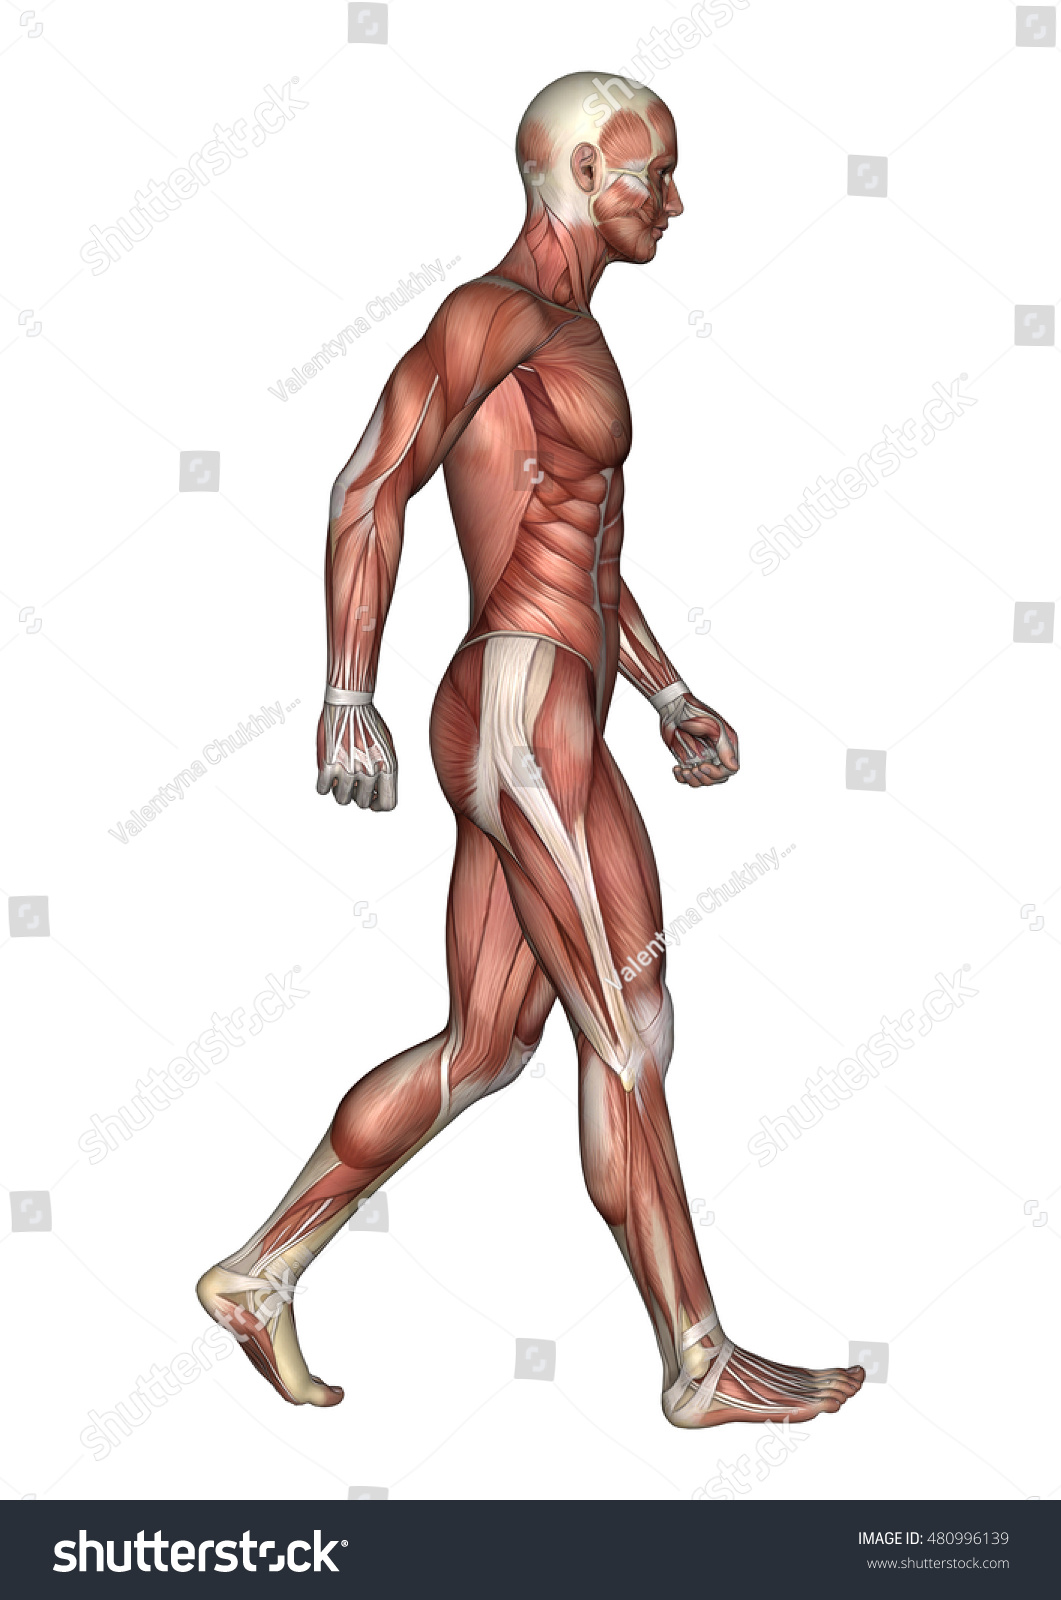 3 D Rendering Walking Male Anatomy Figure Stock Illustration